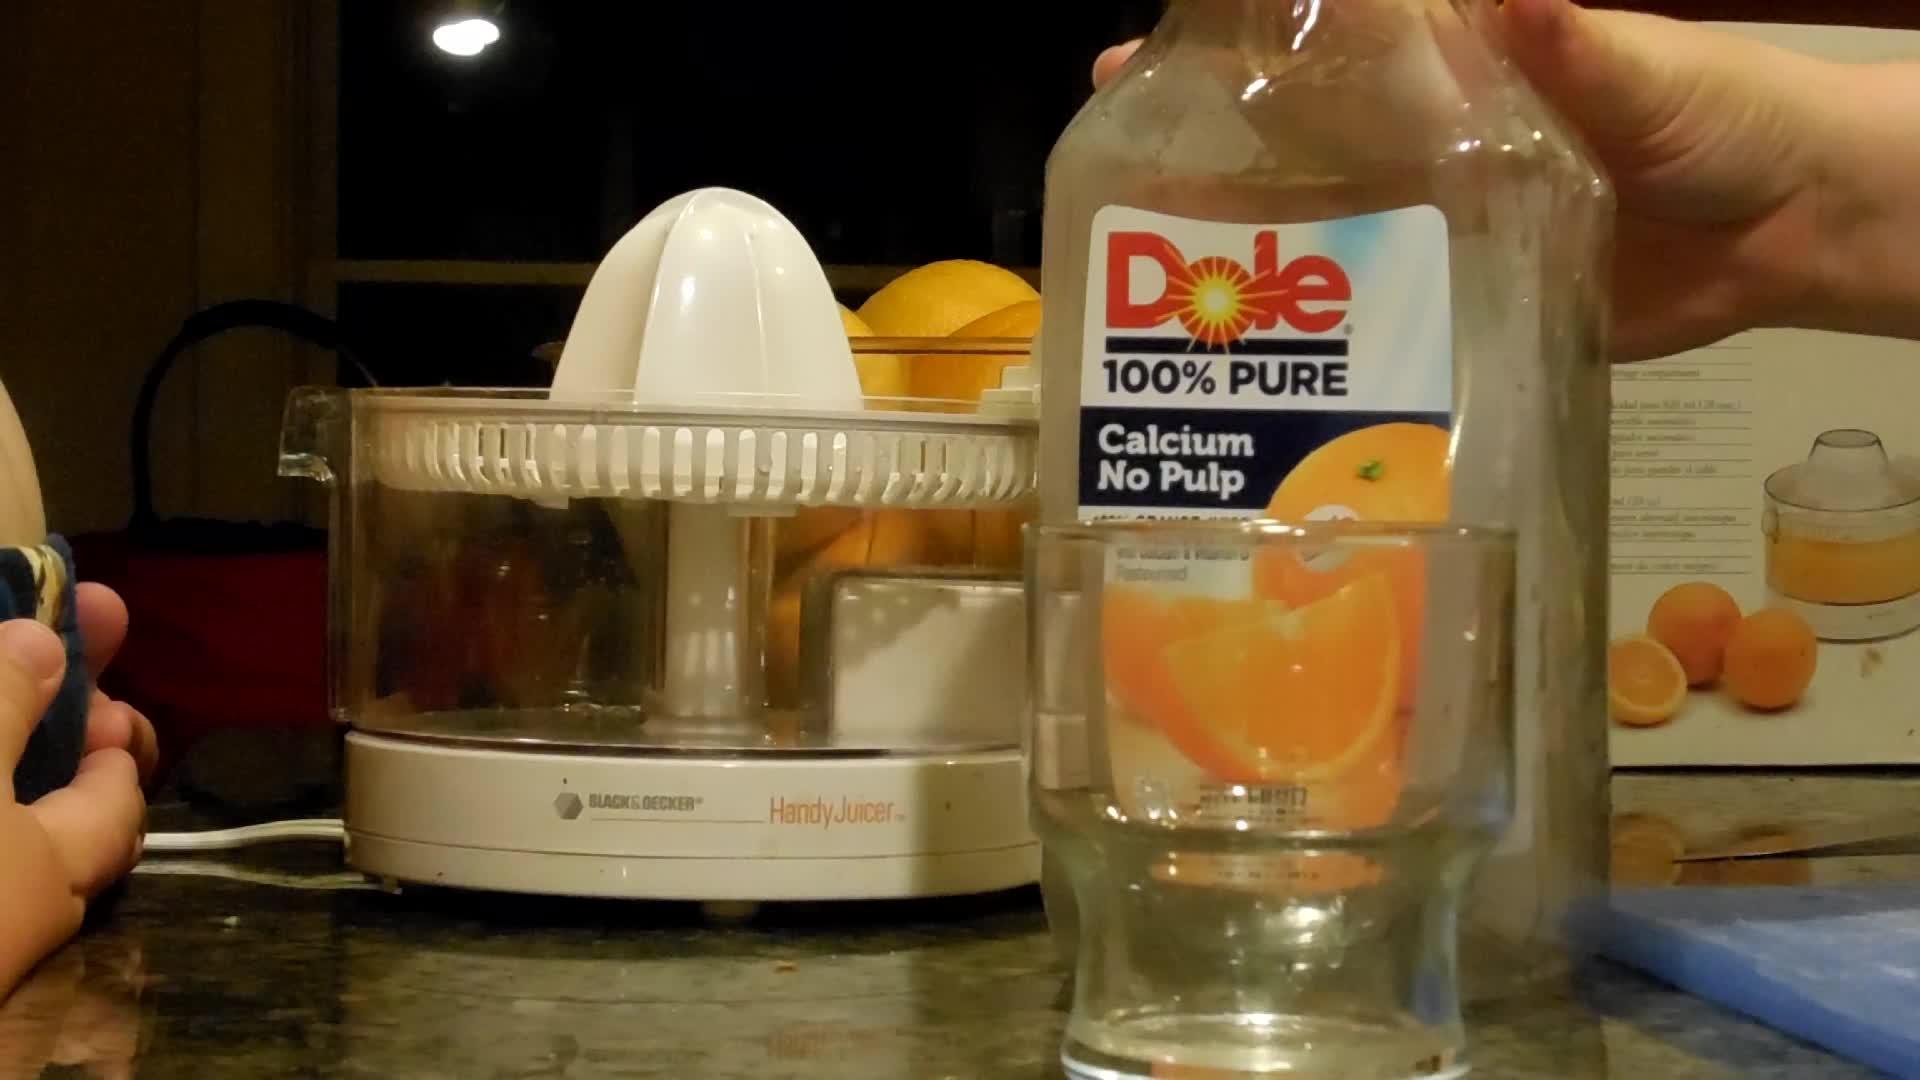 Want some orange juice?